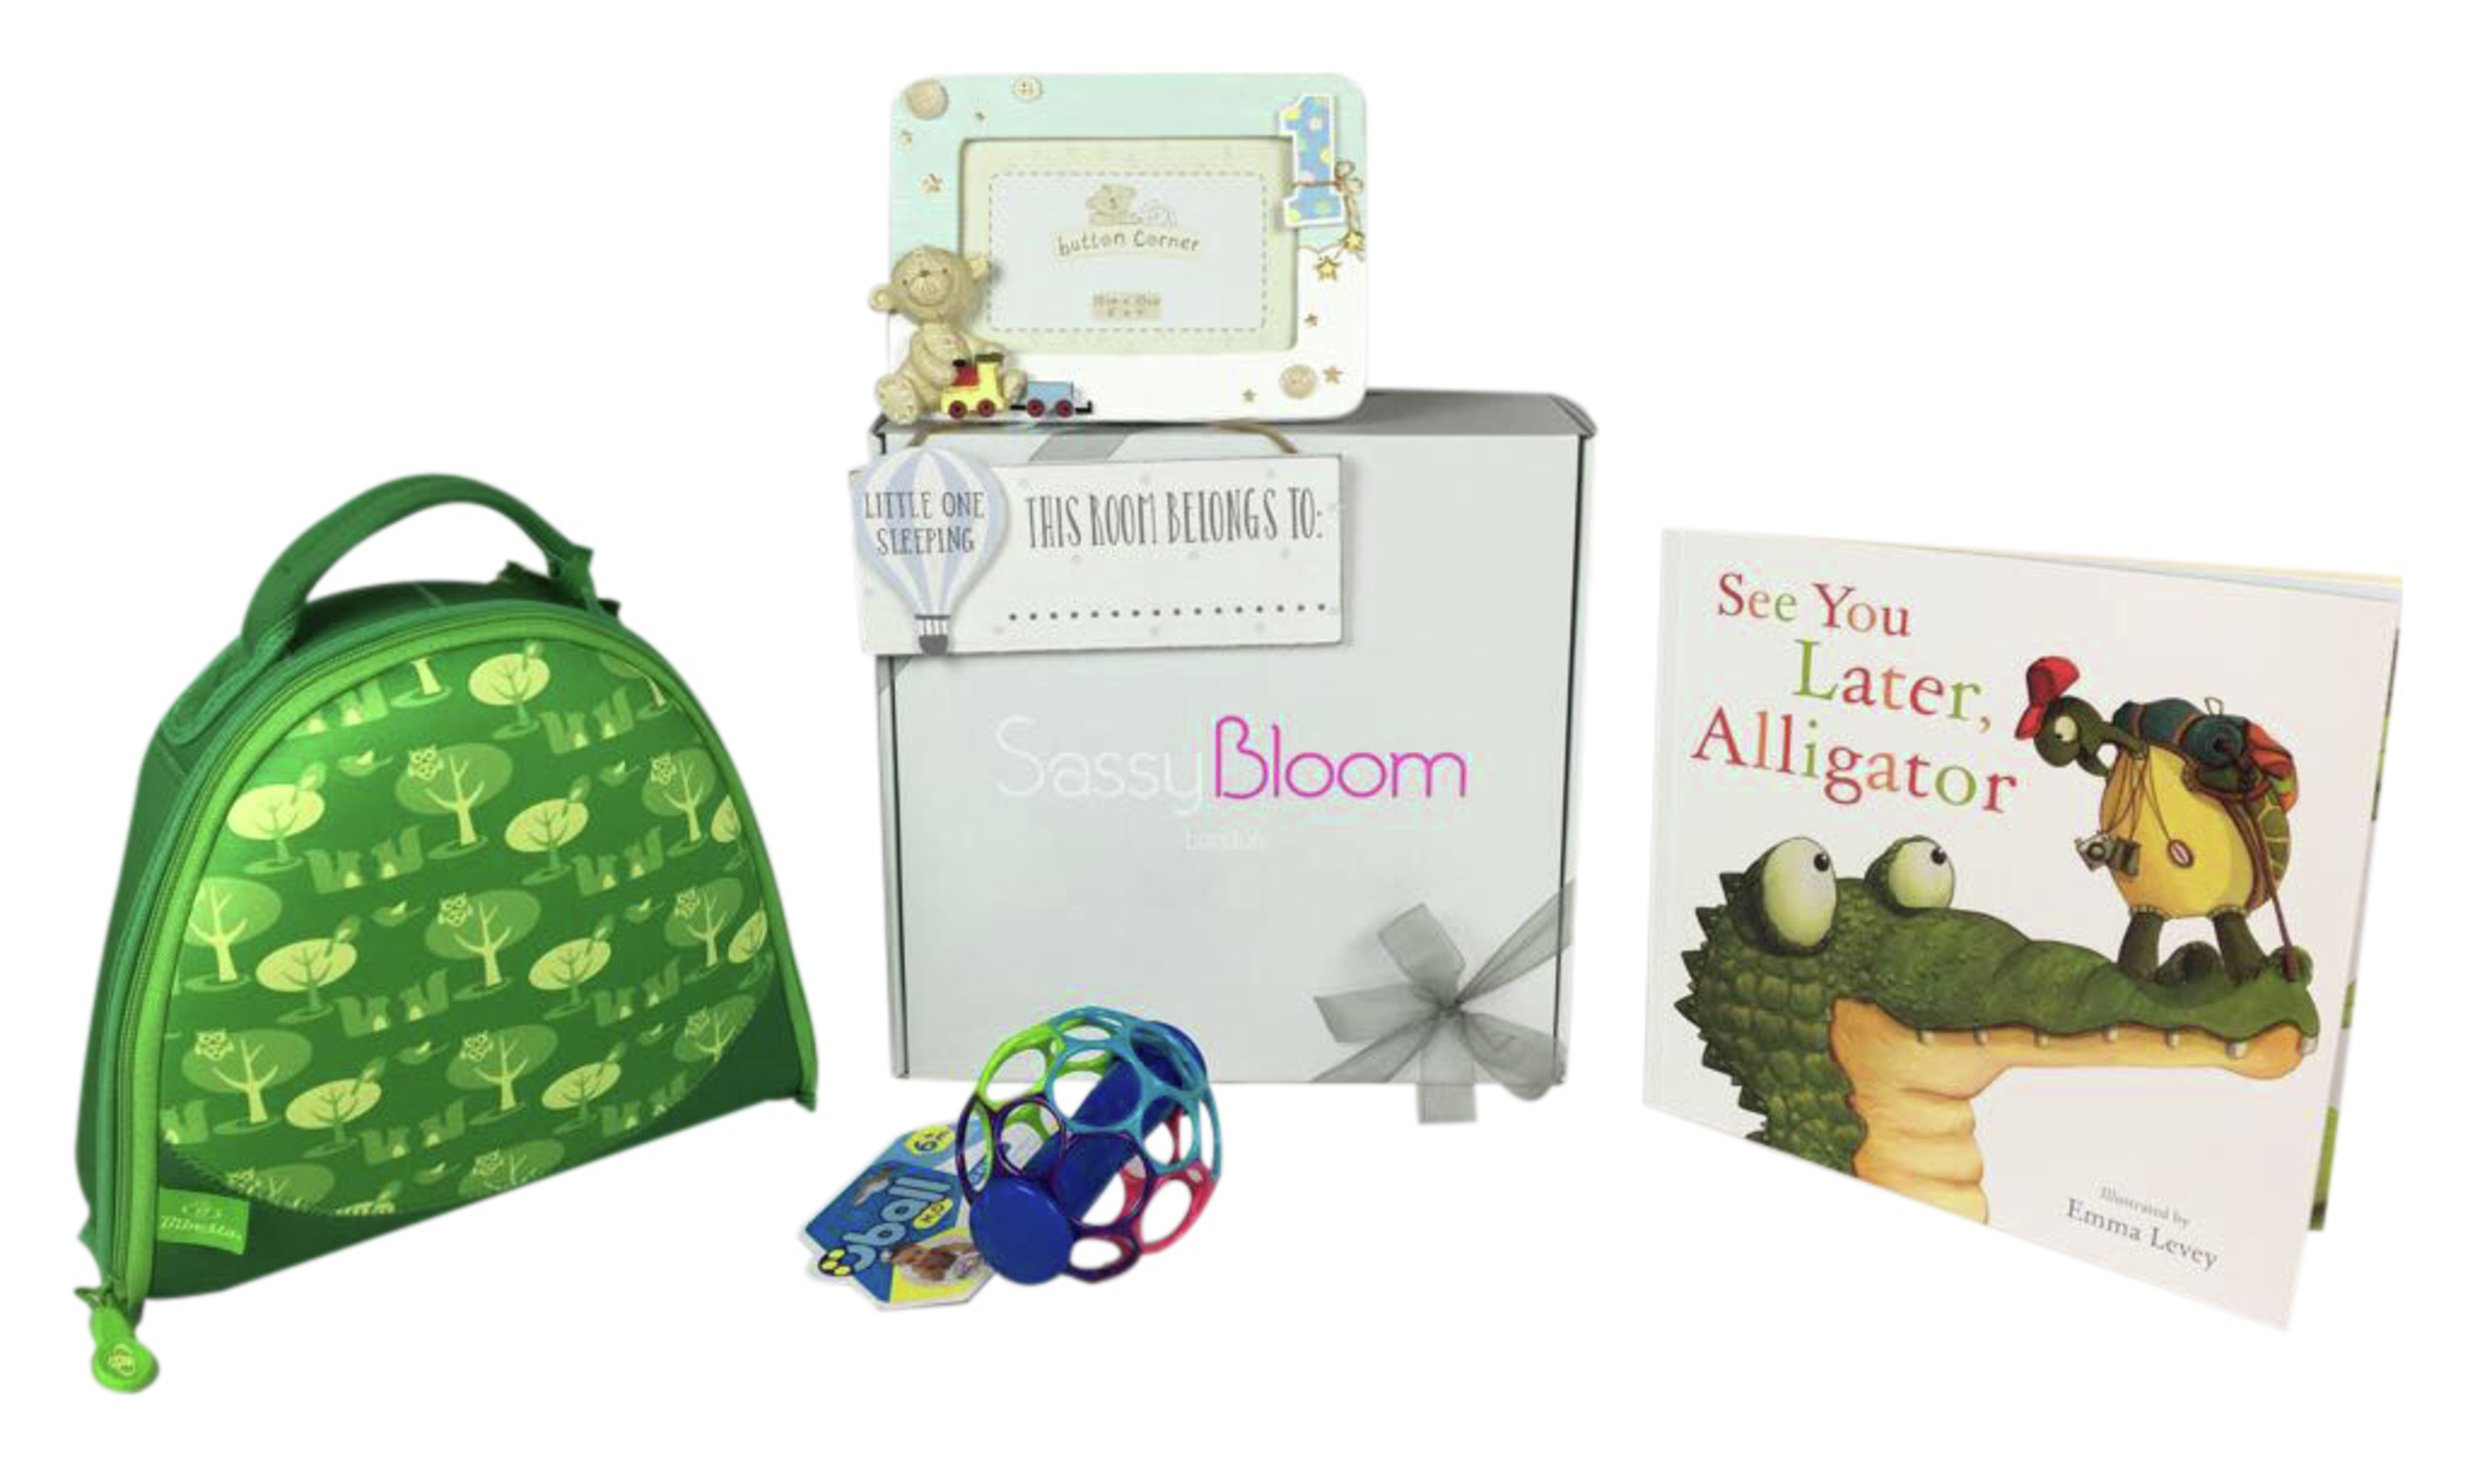 Image of 1st Birthday - Special Edition Boys Sassy Bloom - Box